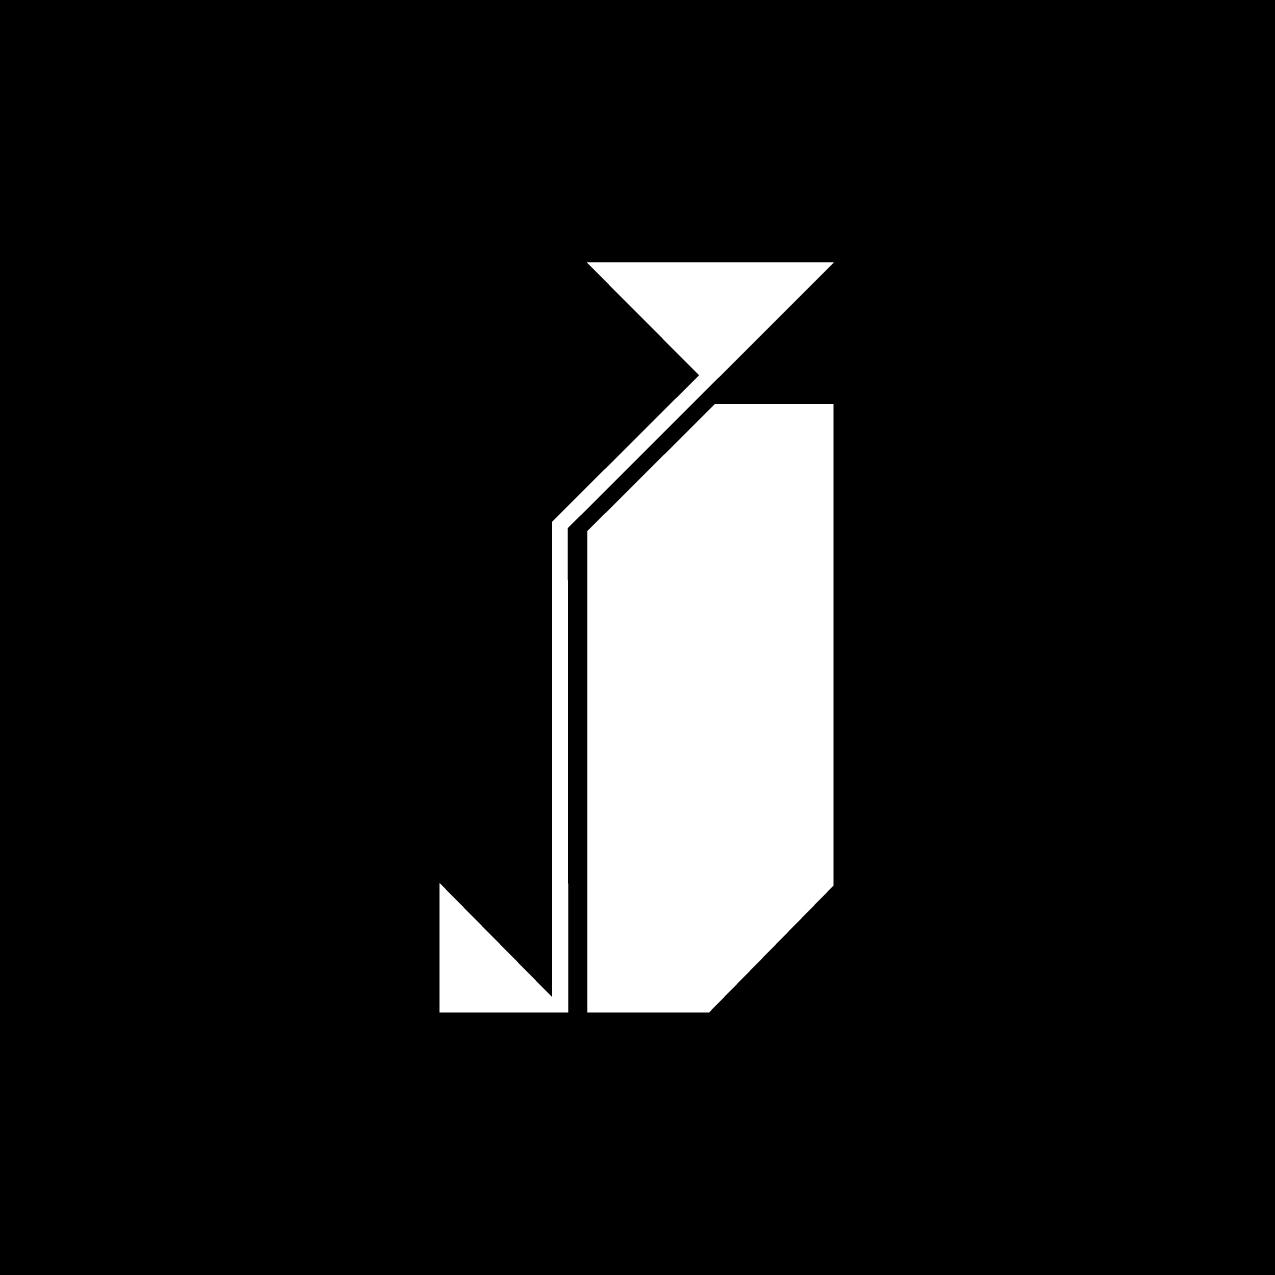 Letter J14 Design by Furia